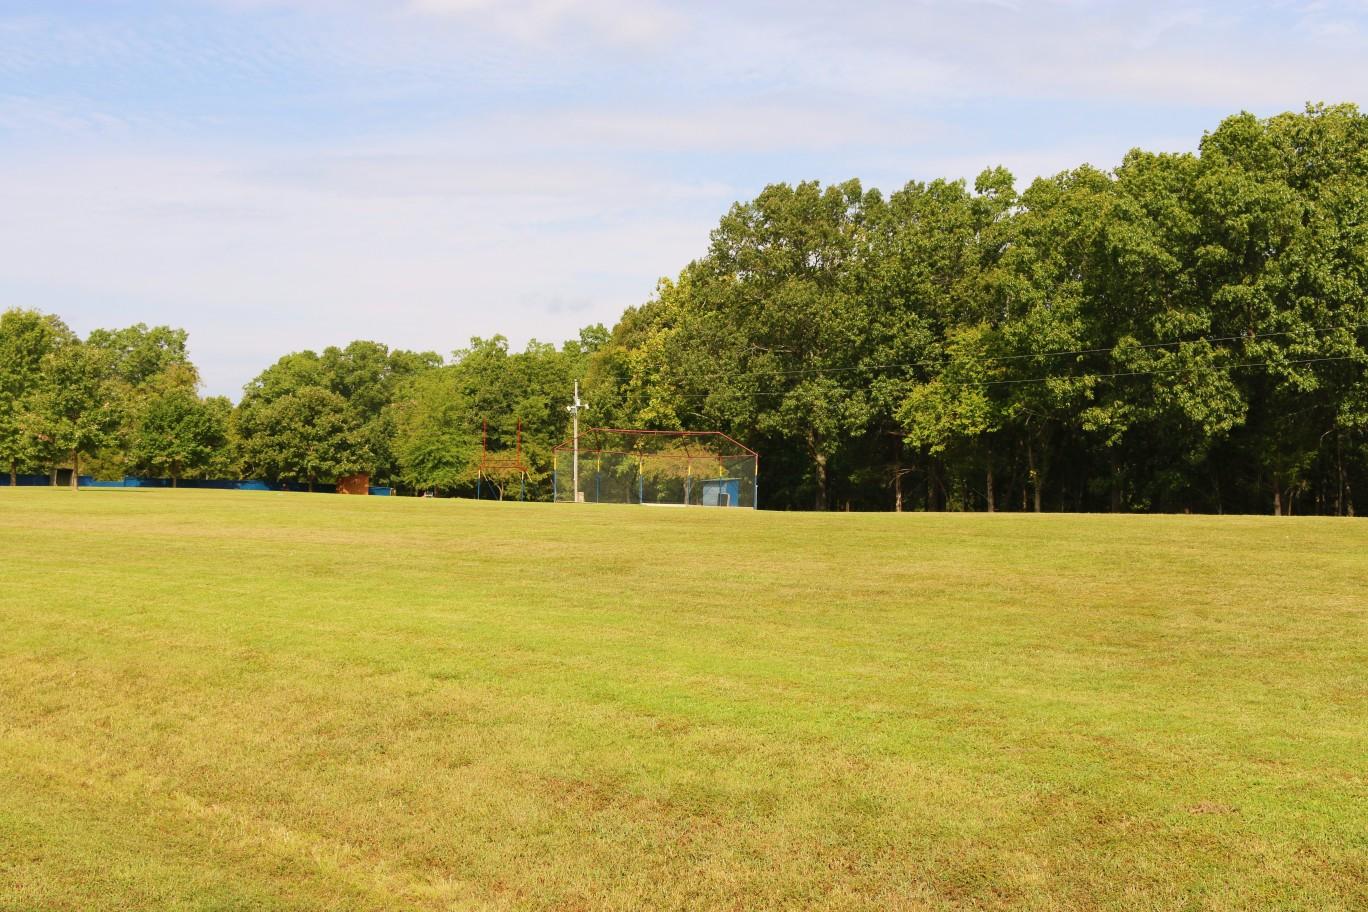 Sports Field 1